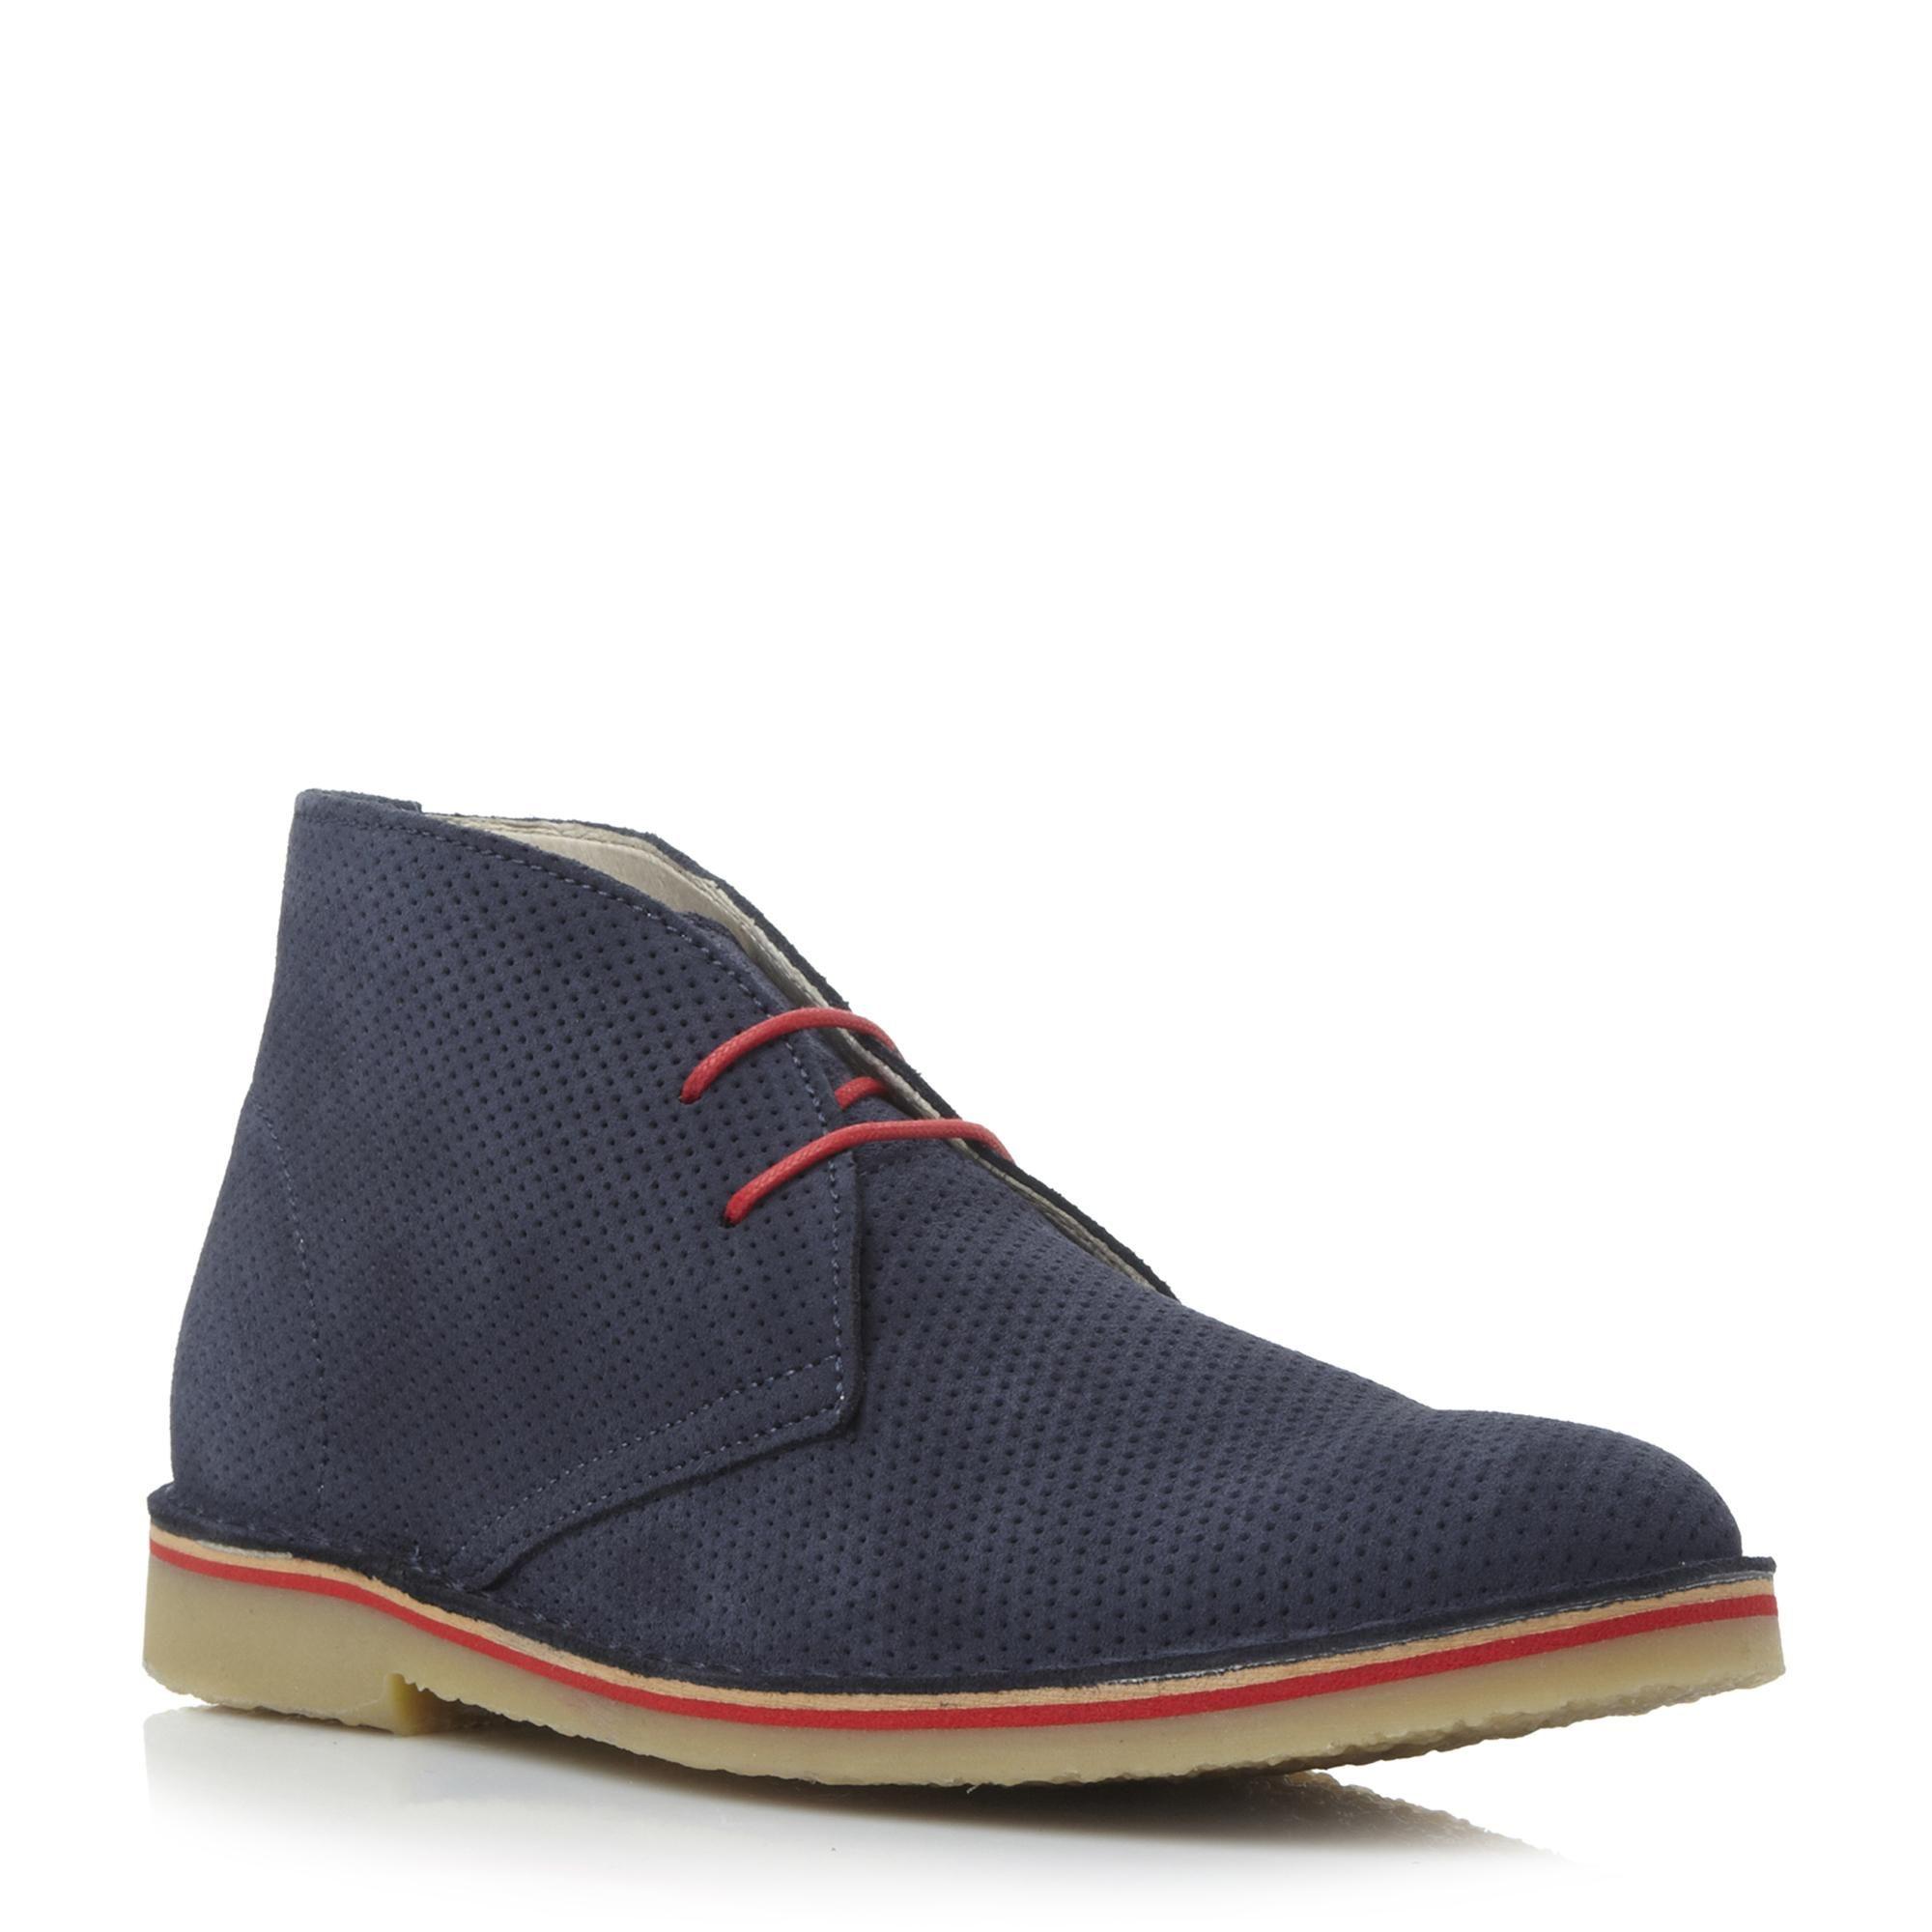 Hogan Jute Unique Desert Boots - Marron jDzrI